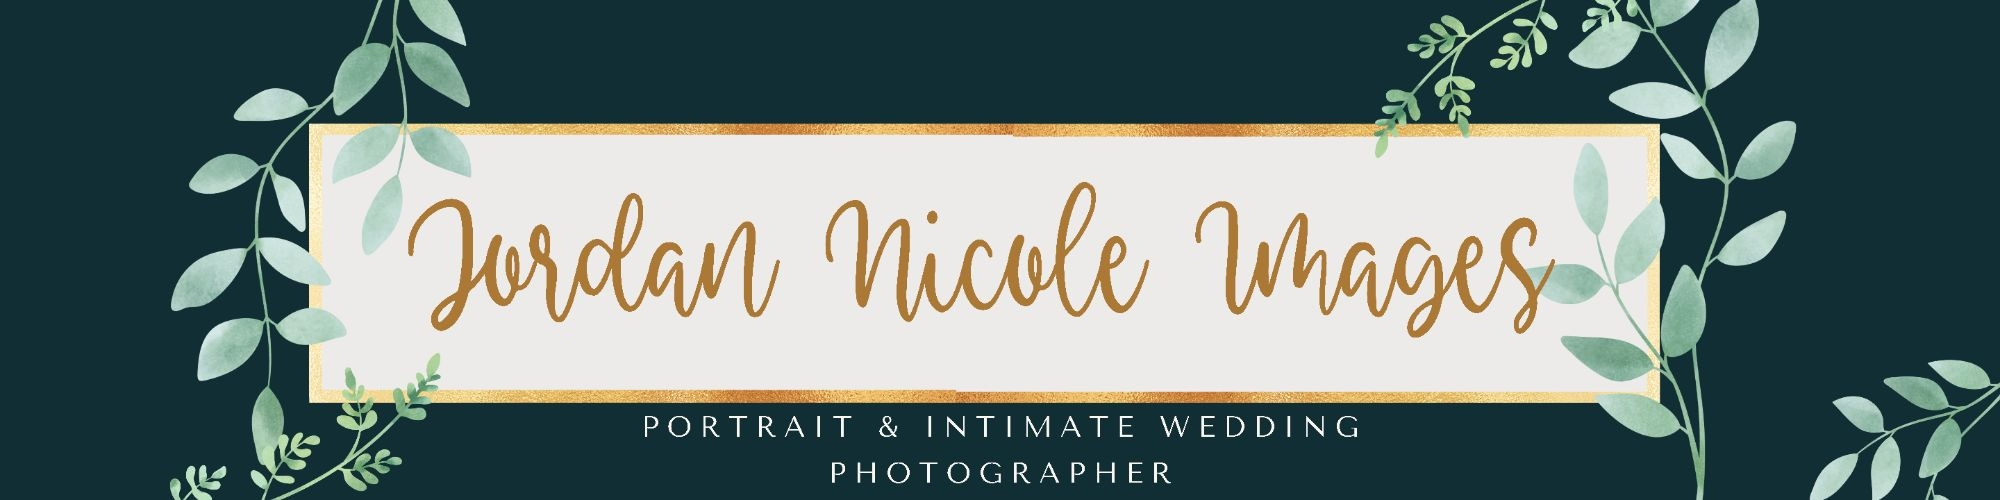 Jordan Nicole images Family Portfolio Header Image